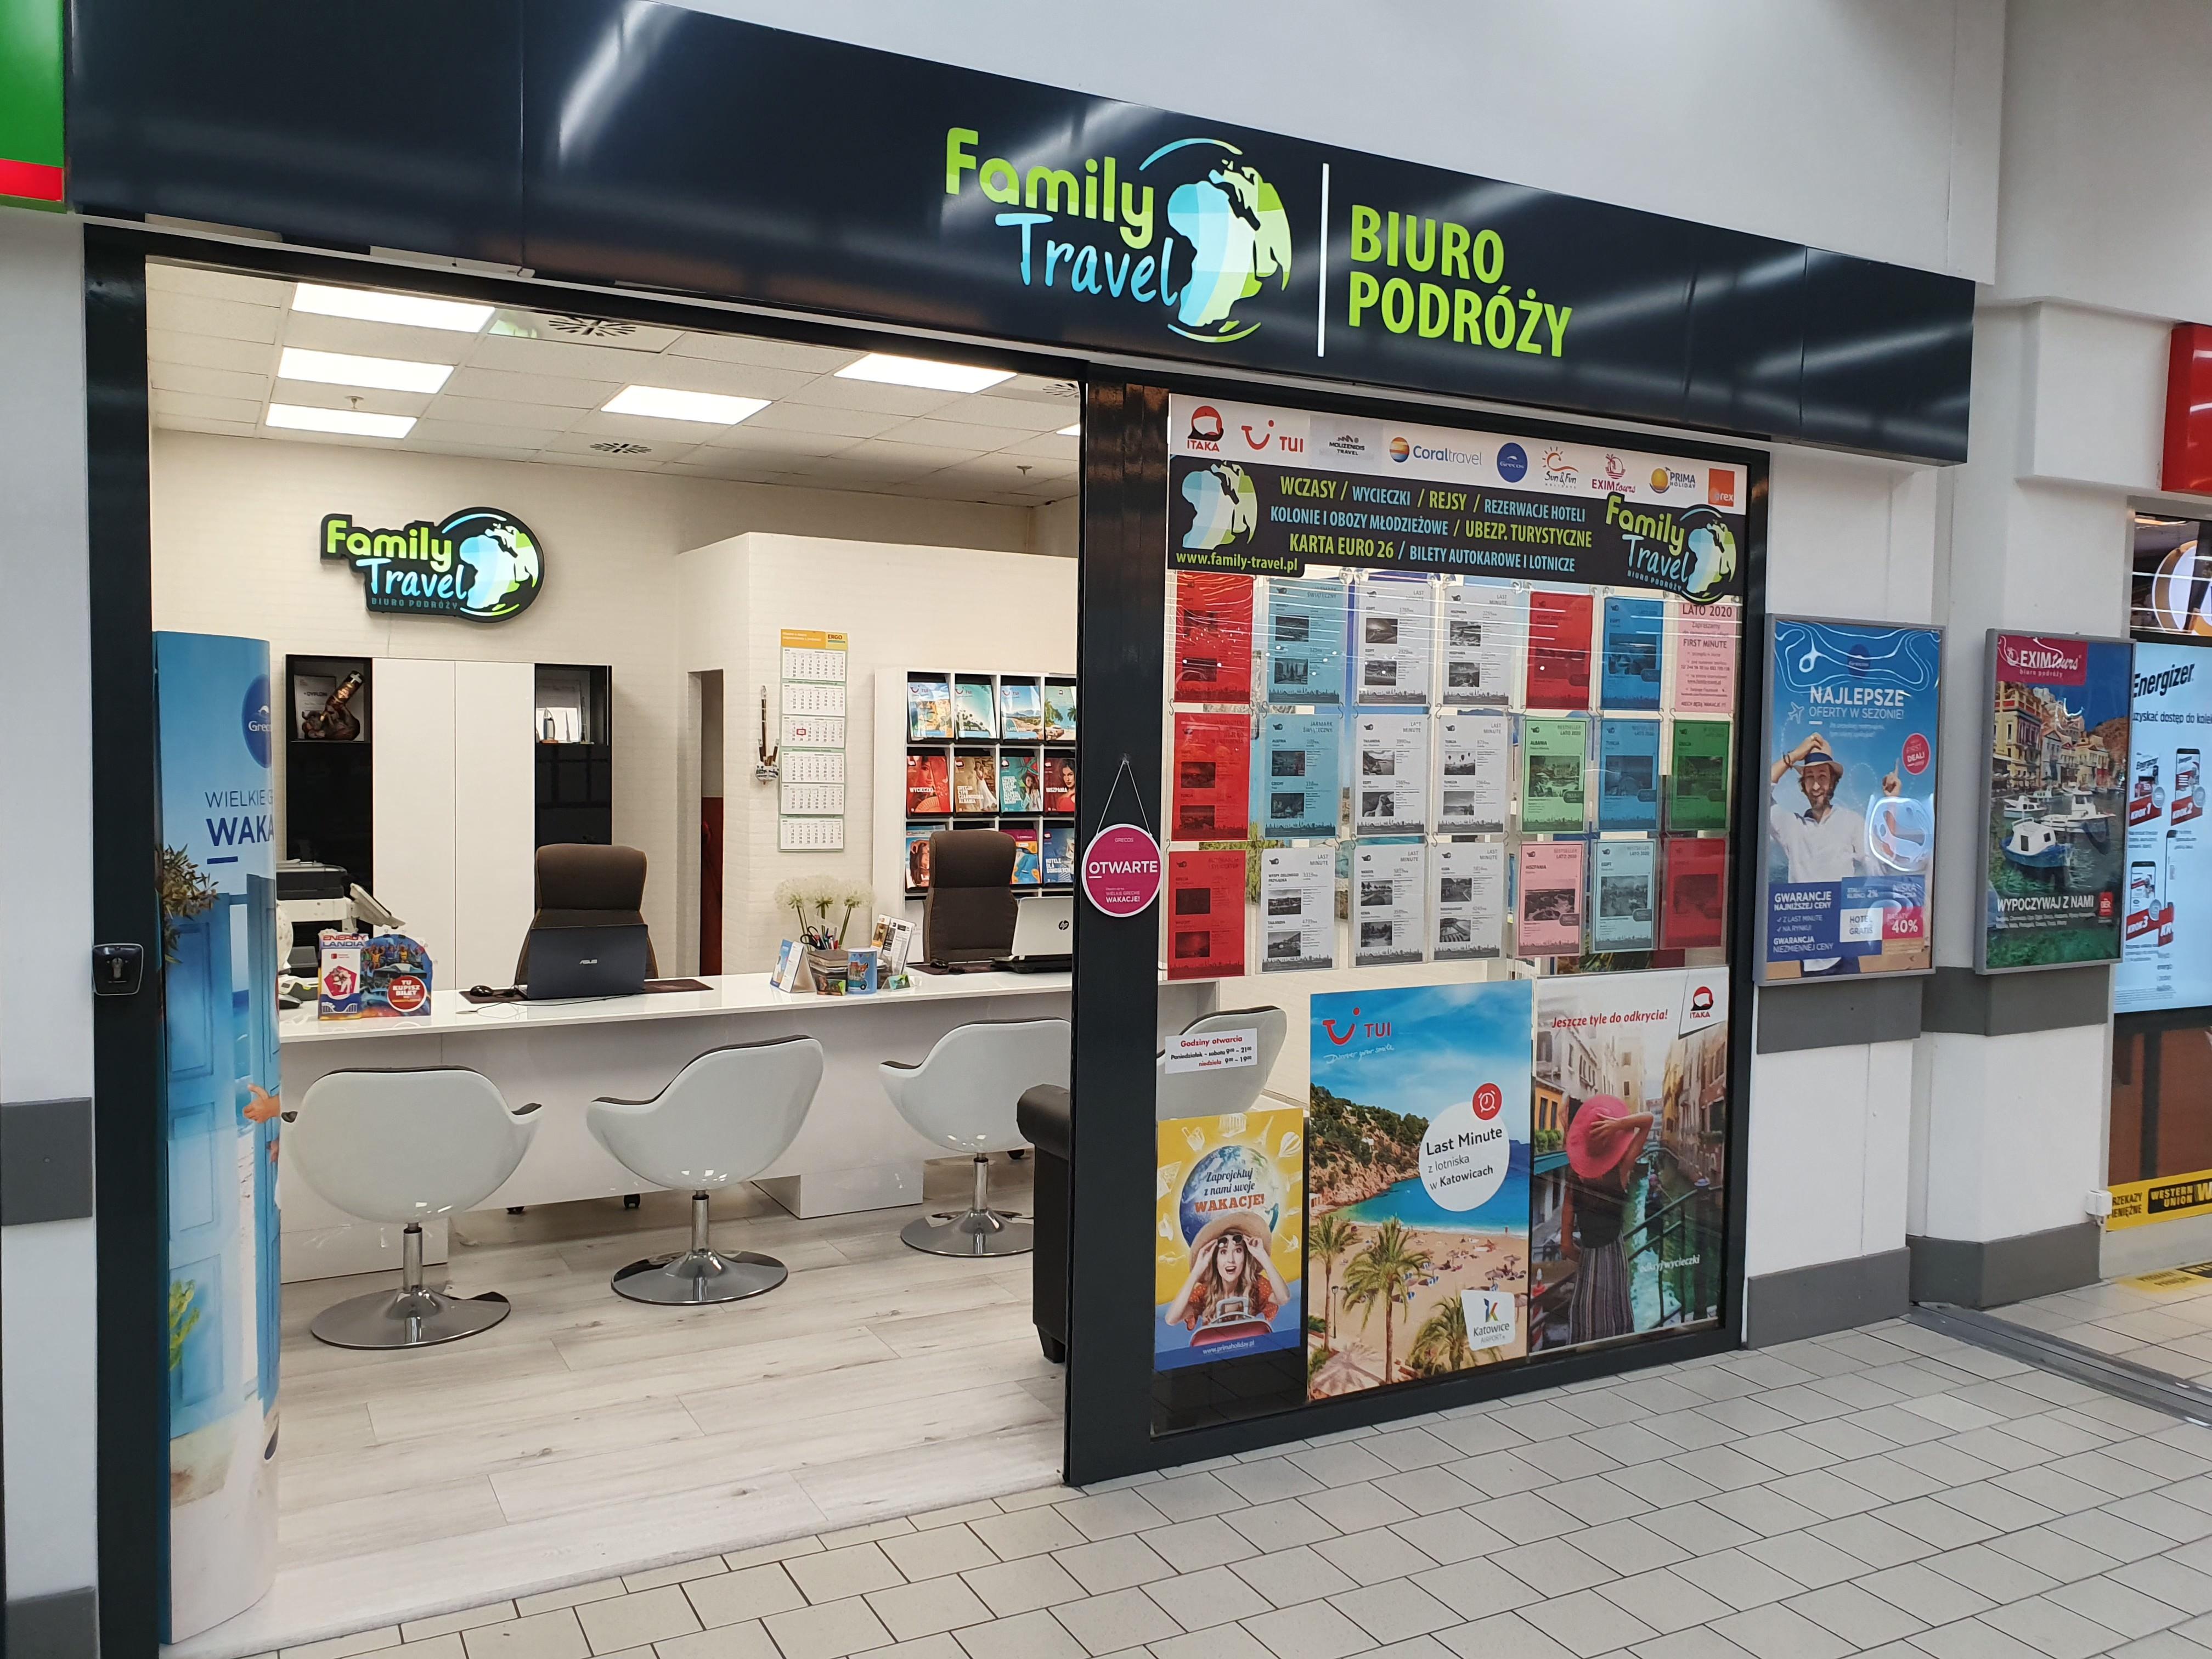 Biuro Podróży Family Travel